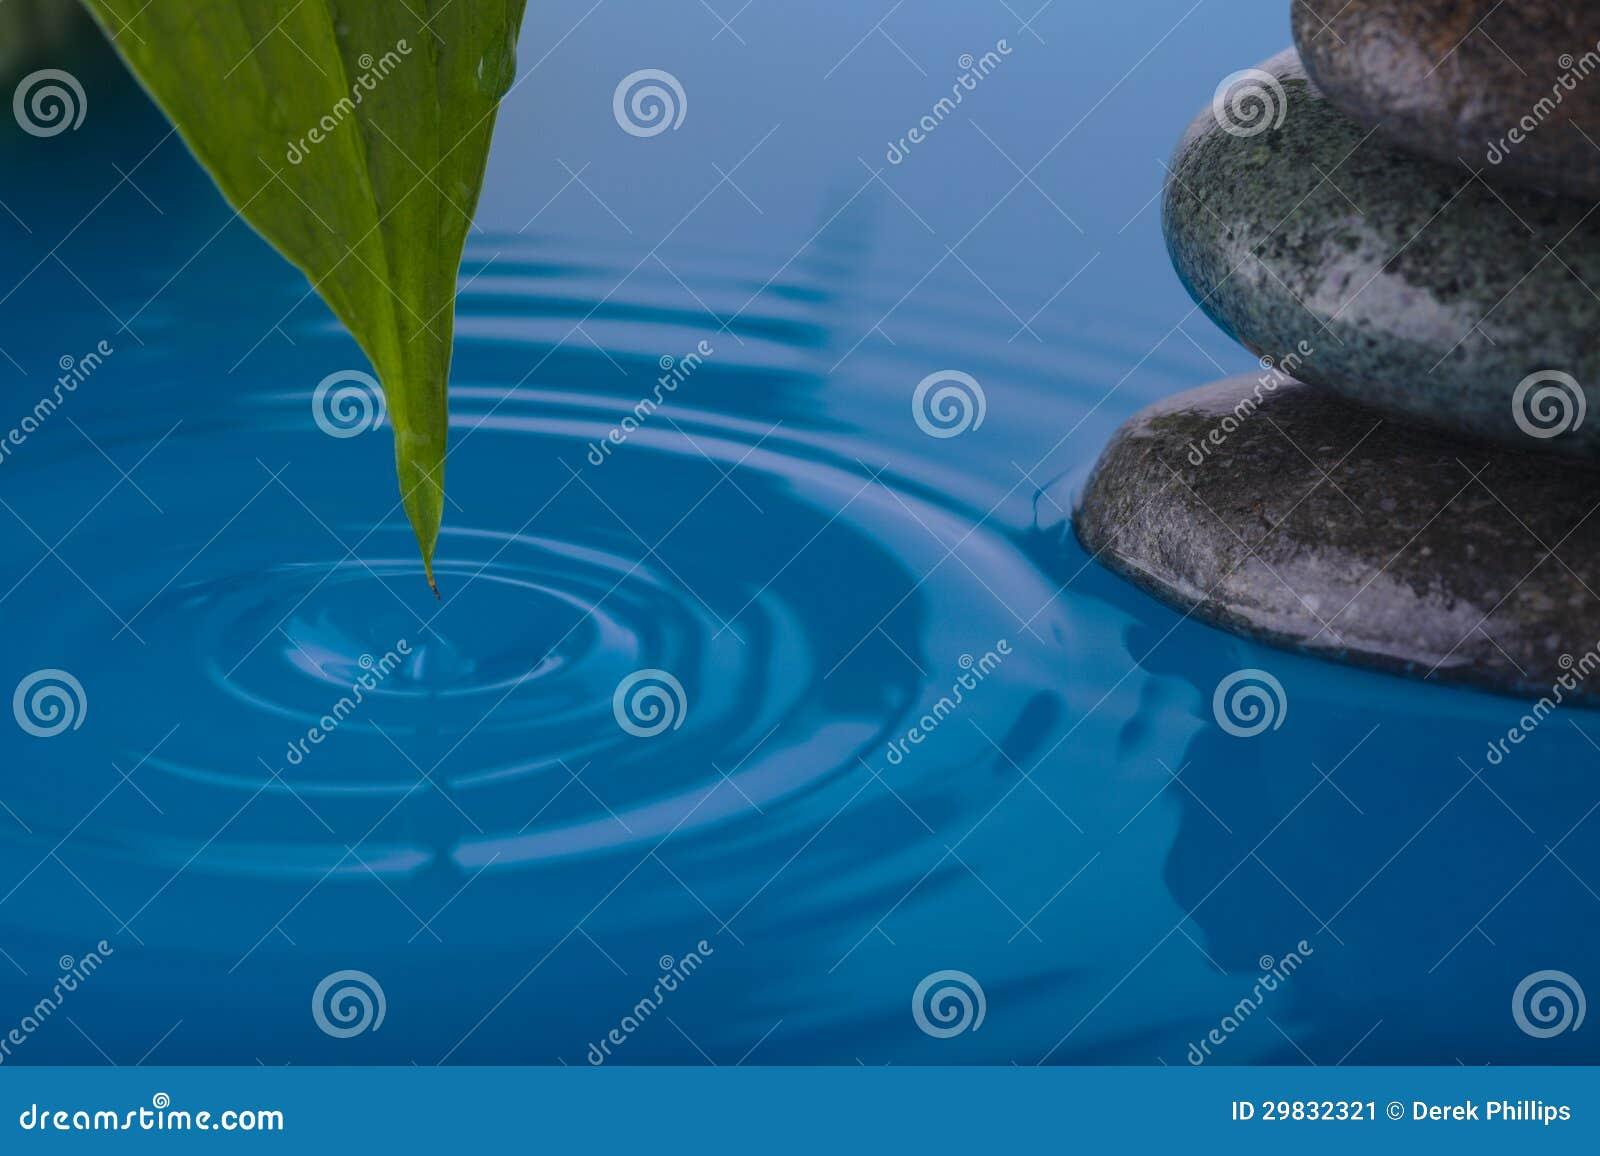 Folha de pedra da água do zen e da planta da paz